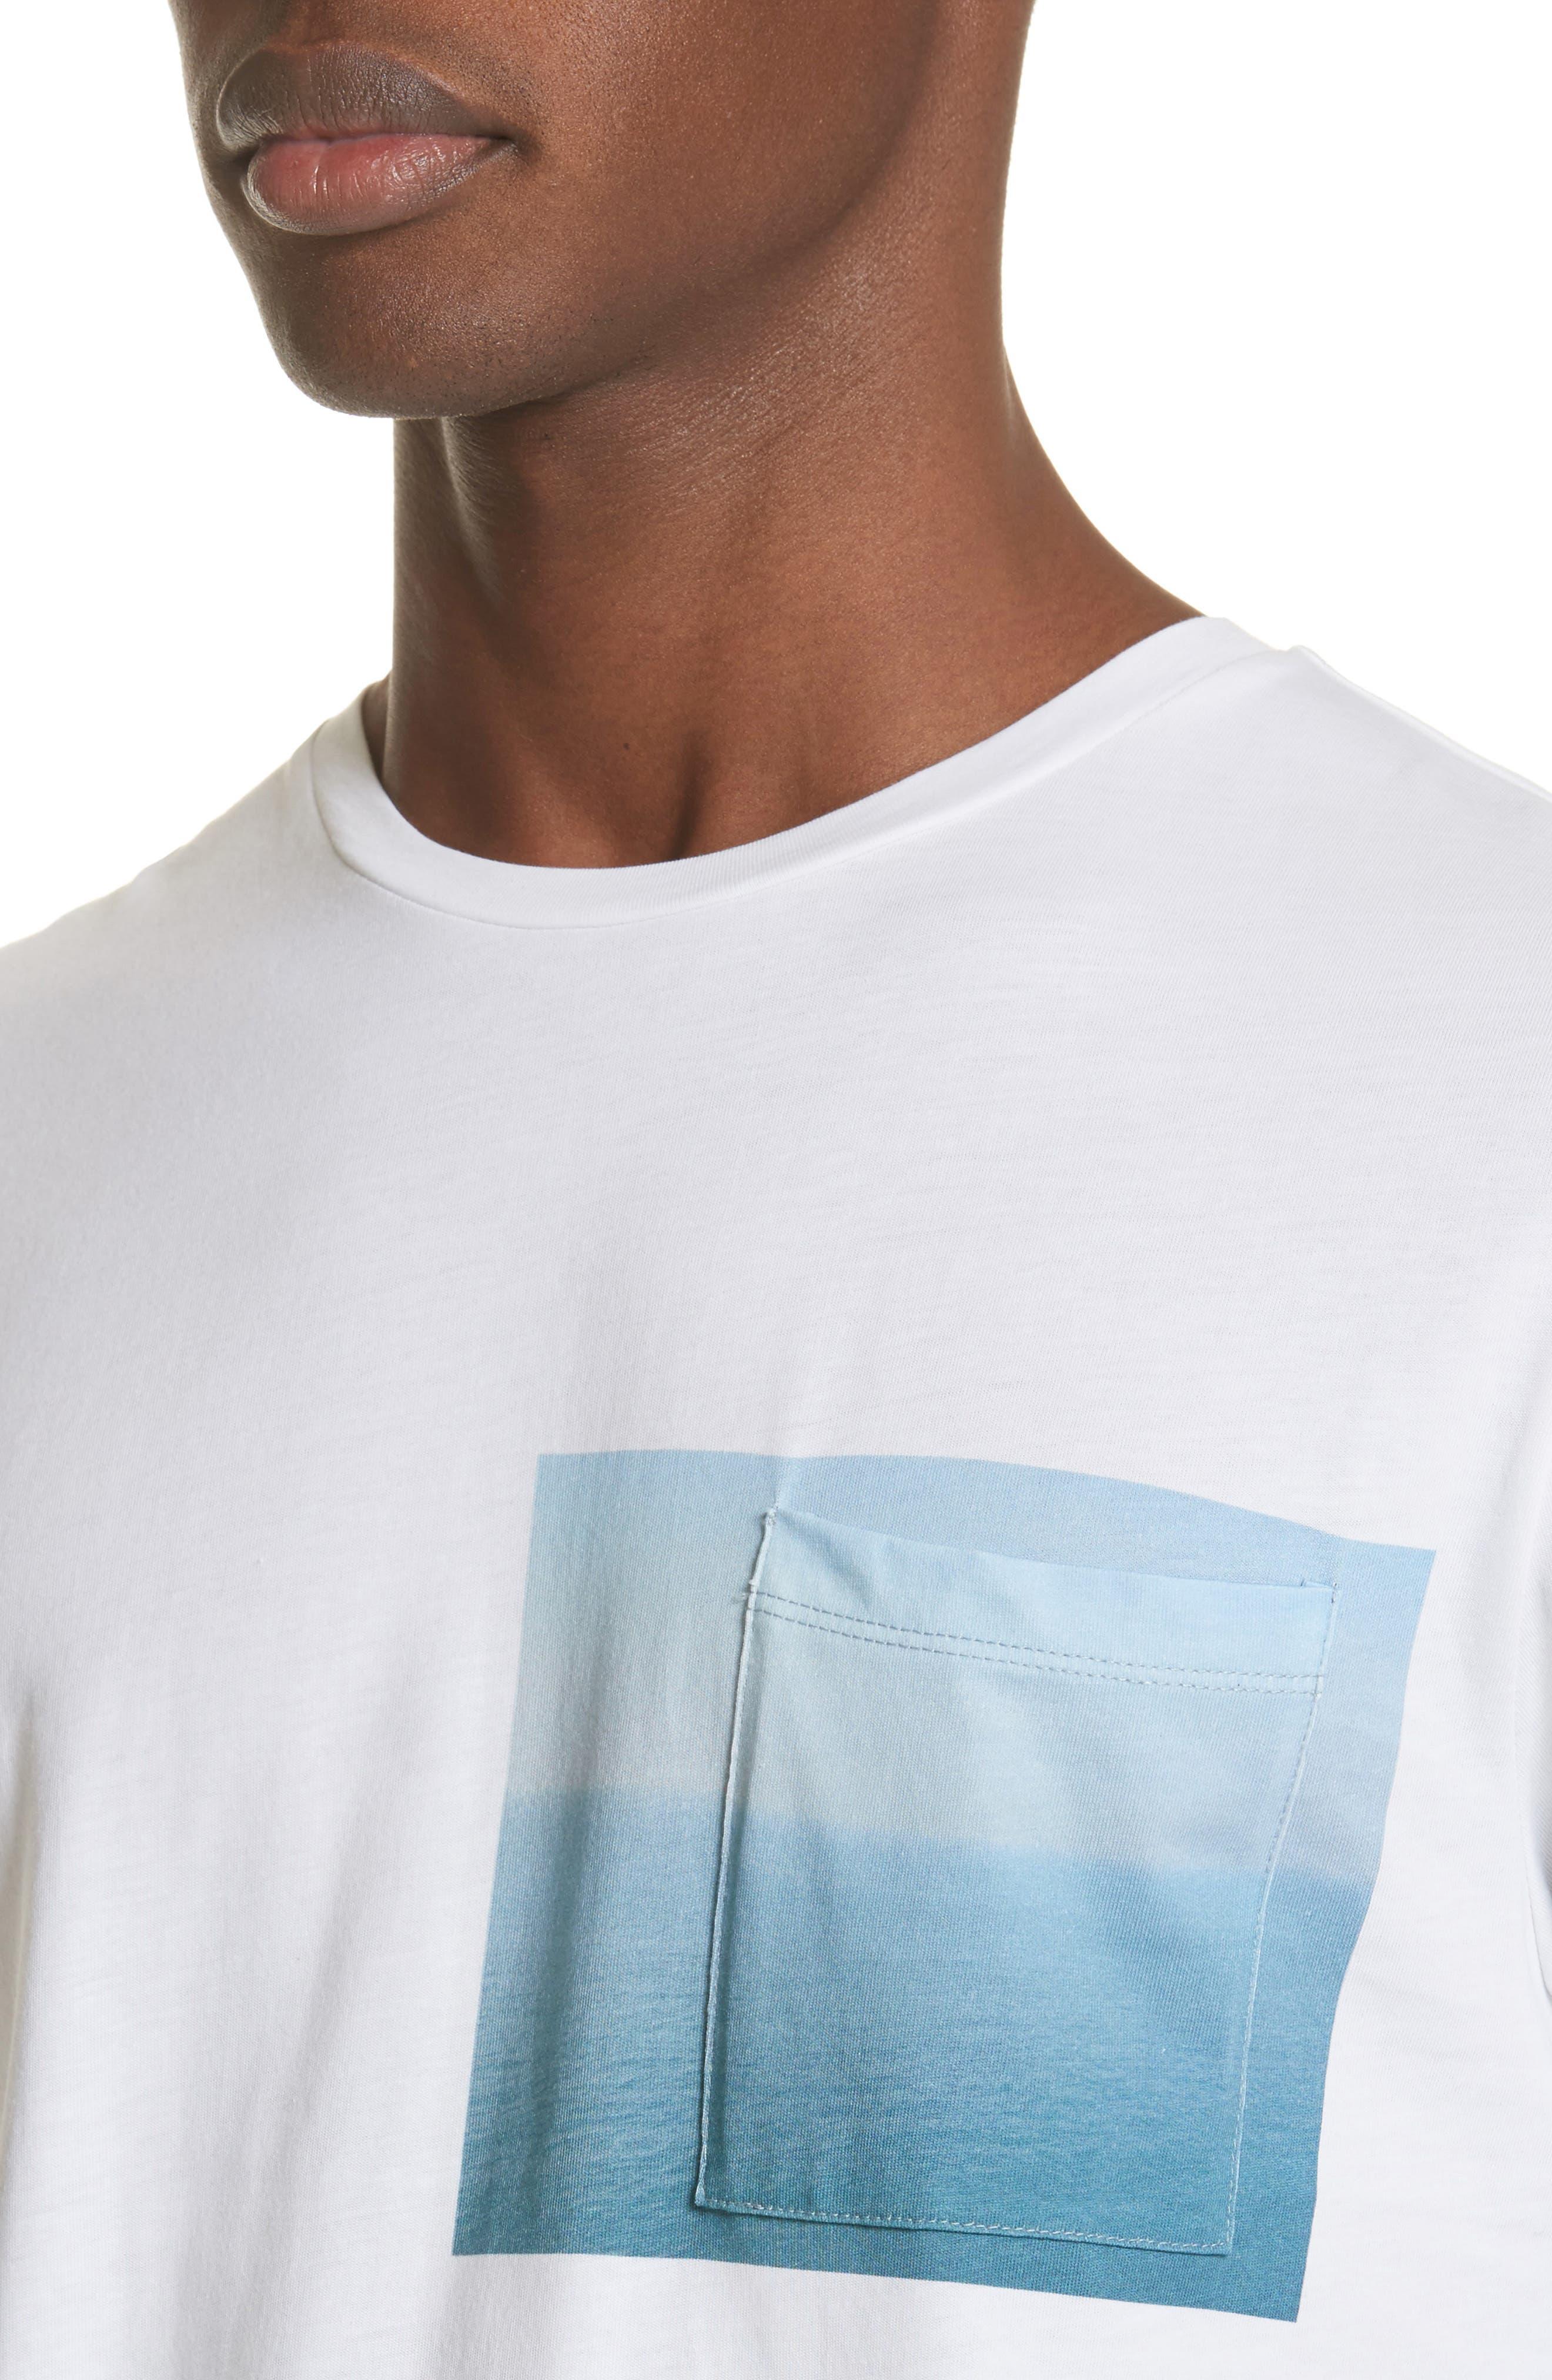 Seaview Print Pocket T-Shirt,                             Alternate thumbnail 4, color,                             WHITE